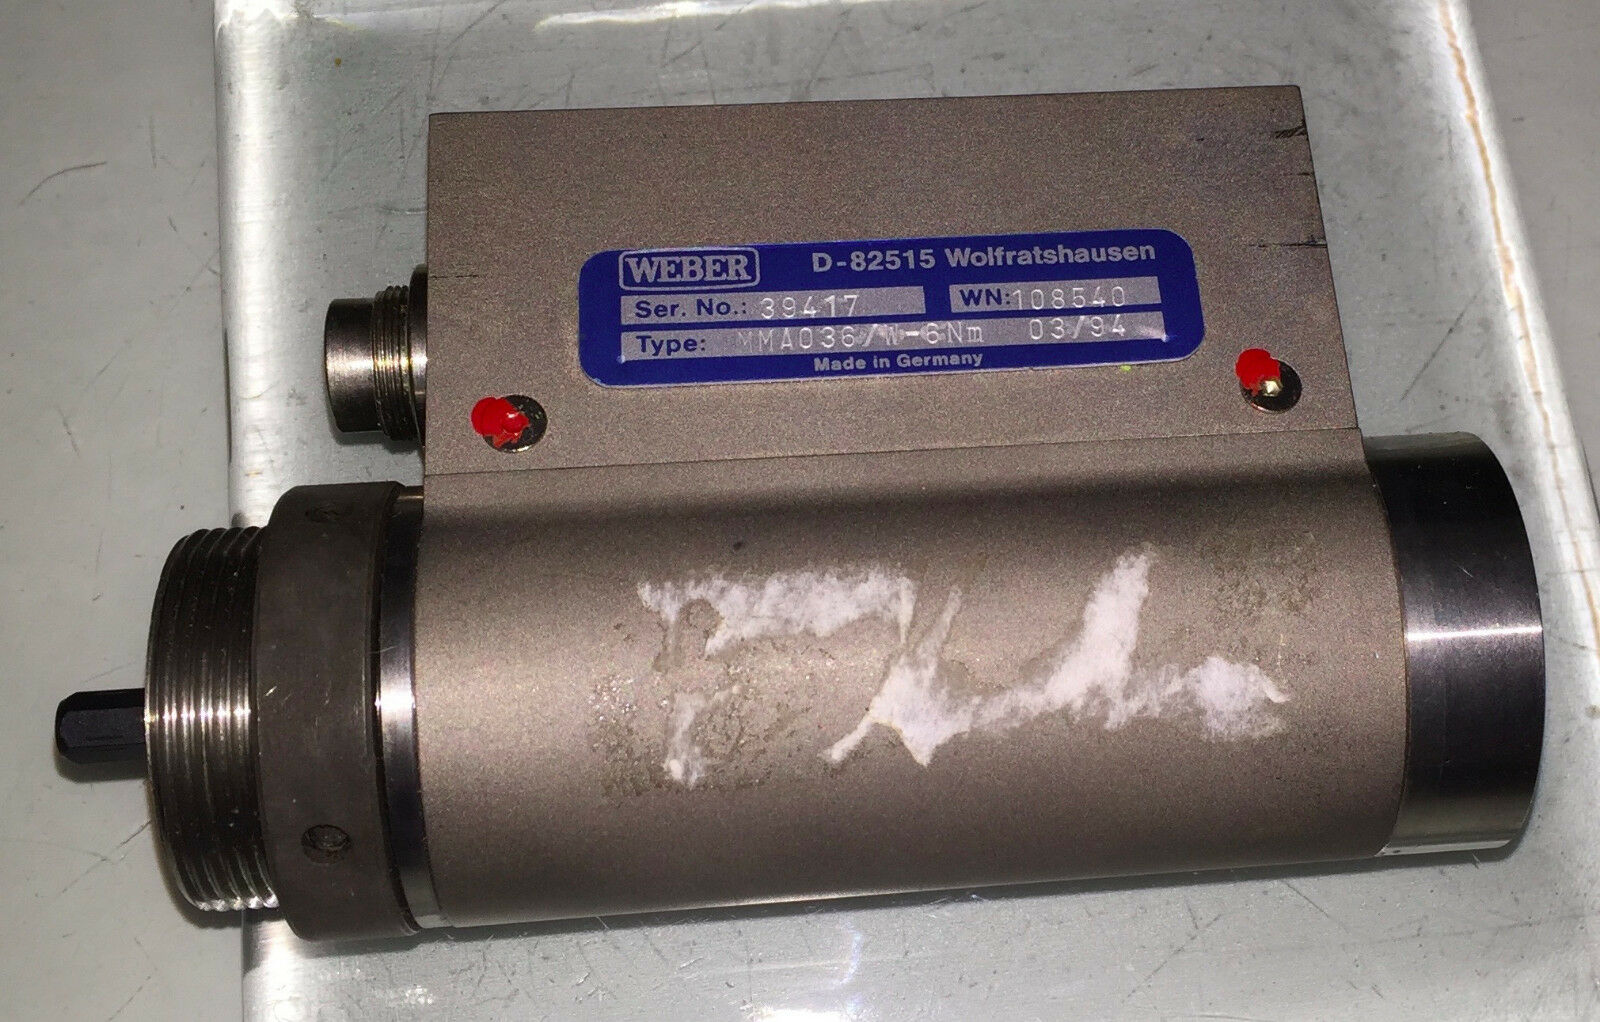 Weber - D-82515 - Type MMA036 W-6Nm - Wolfratshausen - Transducer